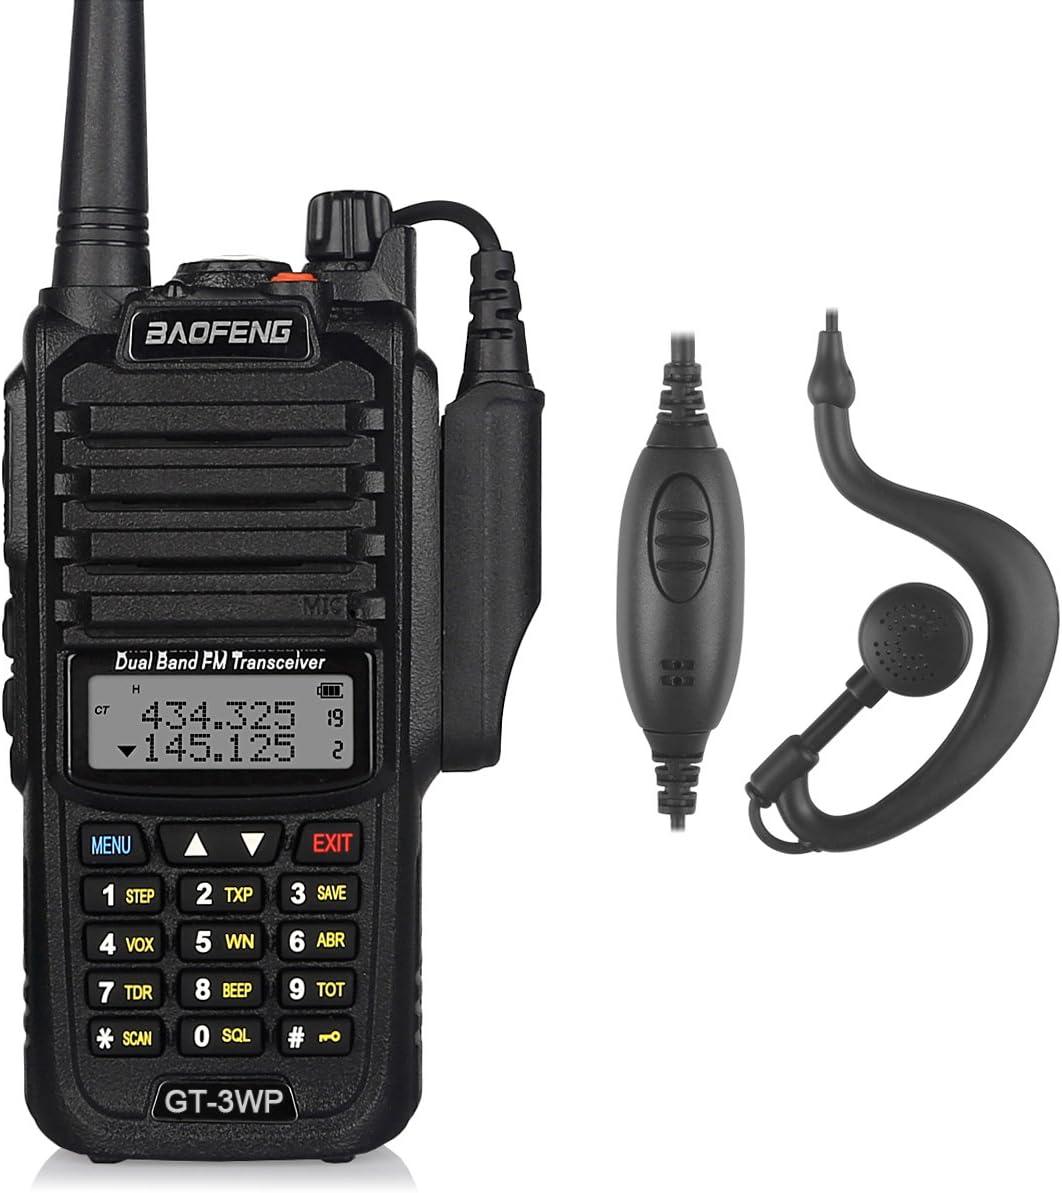 Baofeng Gt 3wp Radio Waterproof Ip67 5 Km Range Vhf Elektronik